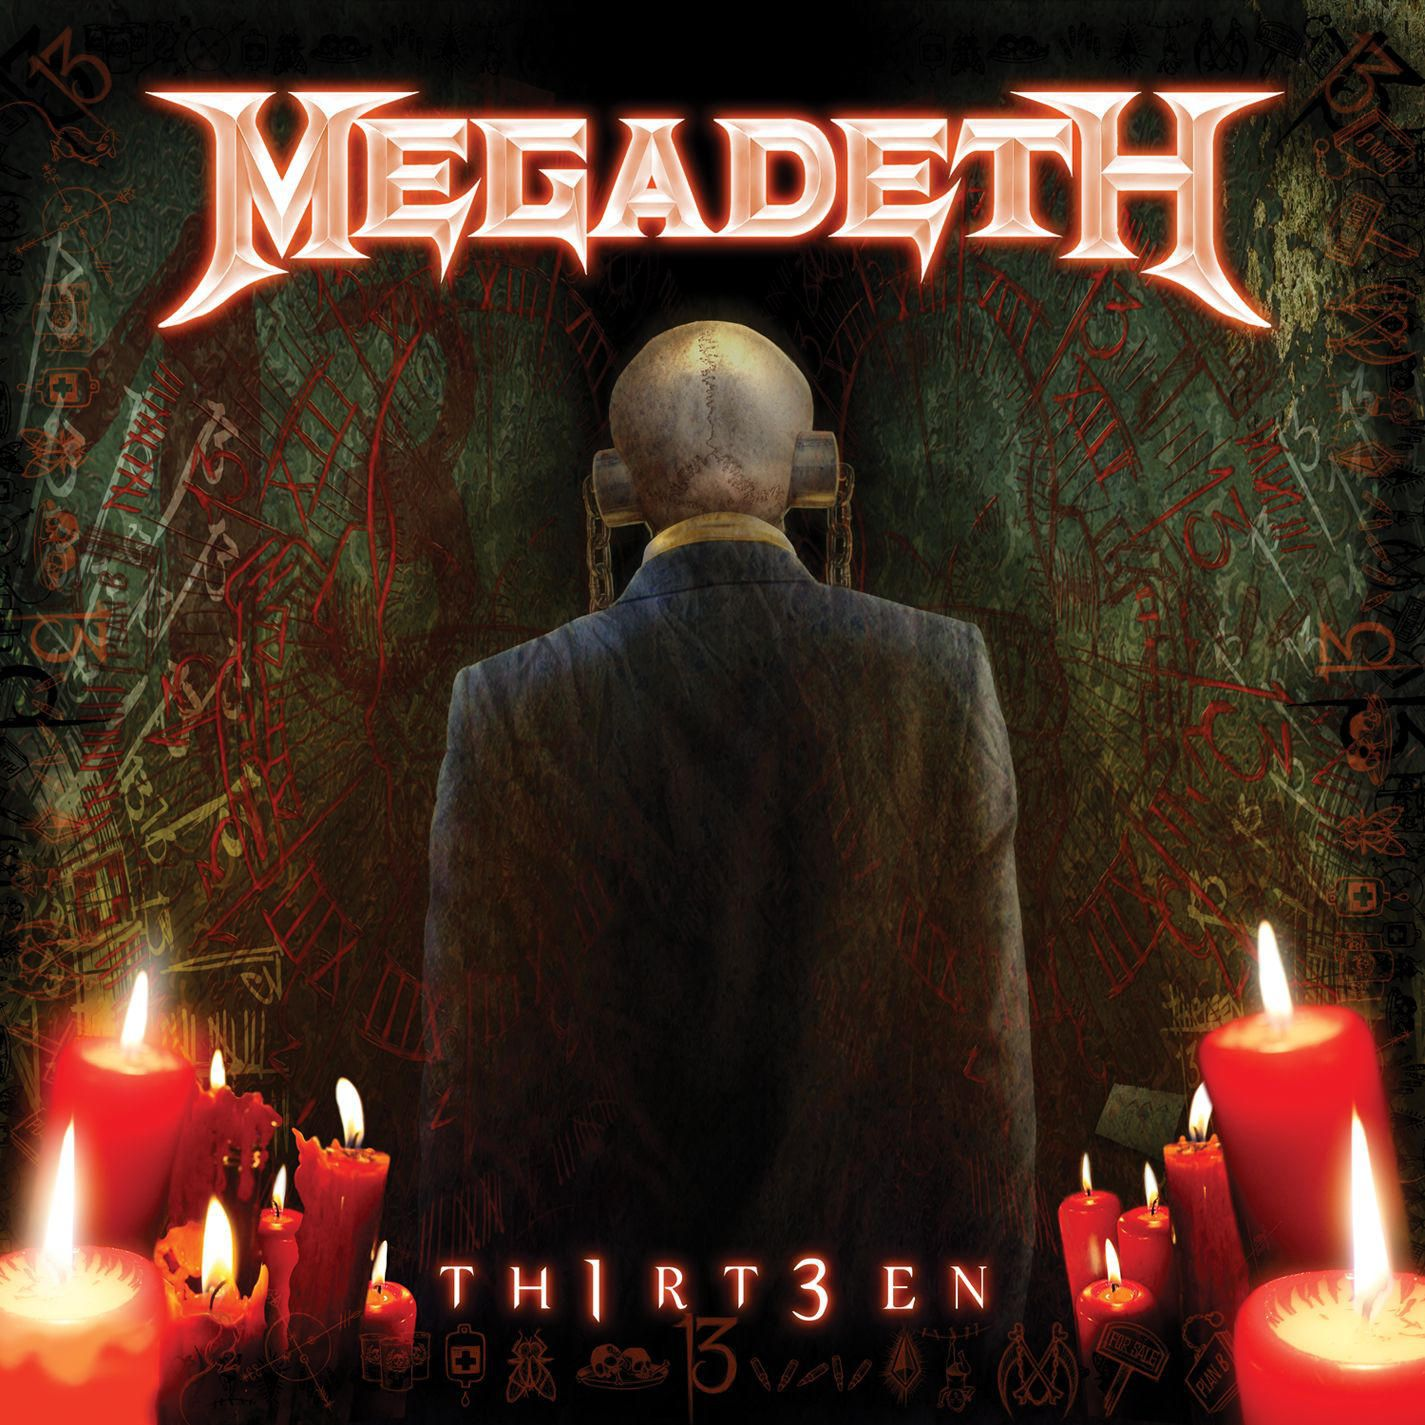 Megadeth - Th1rt3en album cover